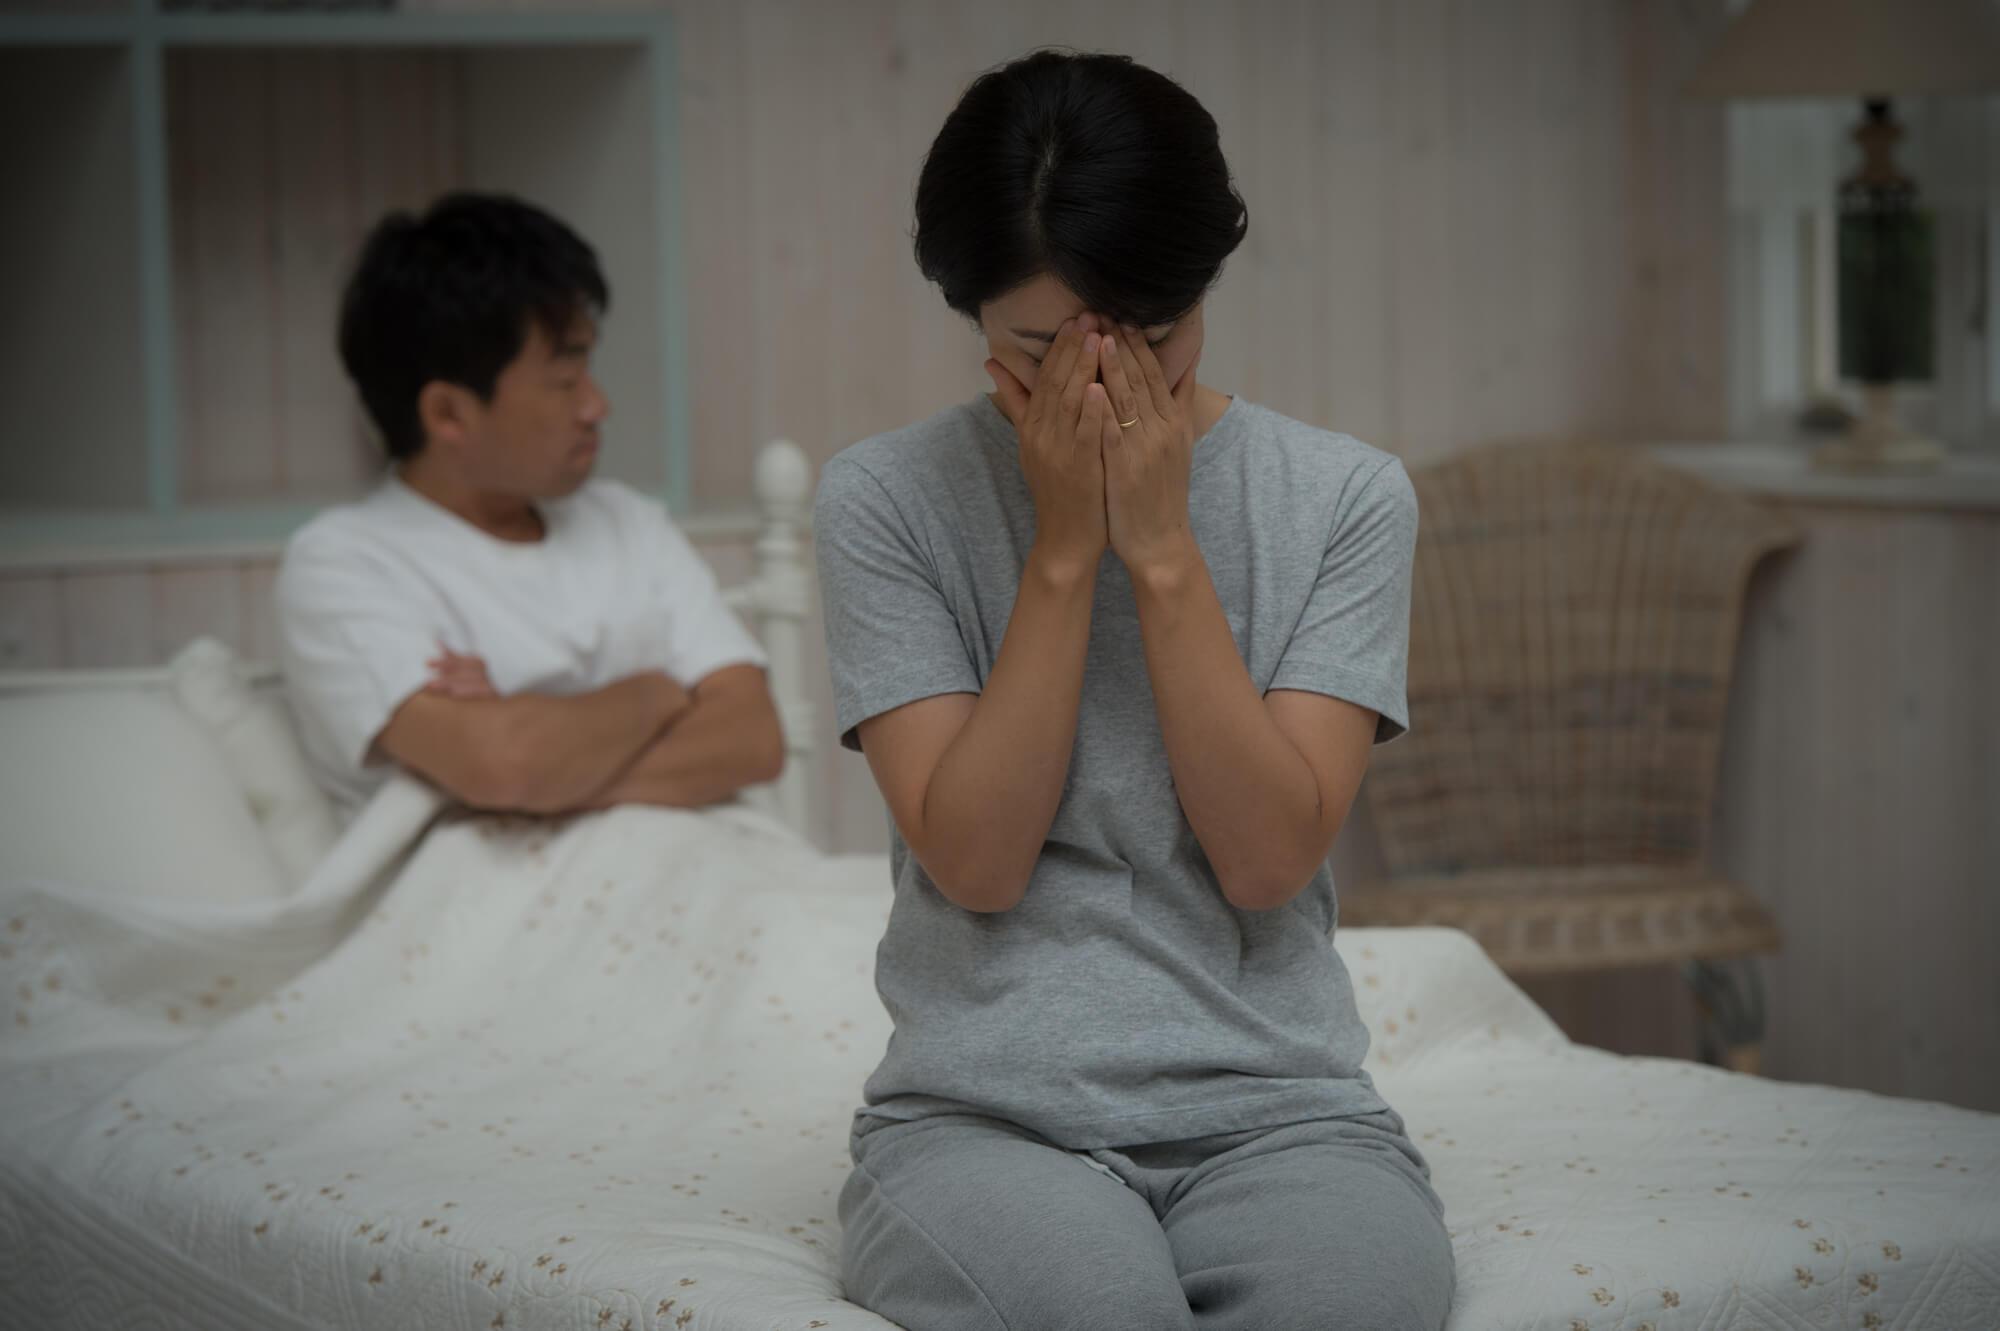 SEXばかり要求してくる性欲が強いモラハラ夫に悩まされている女性